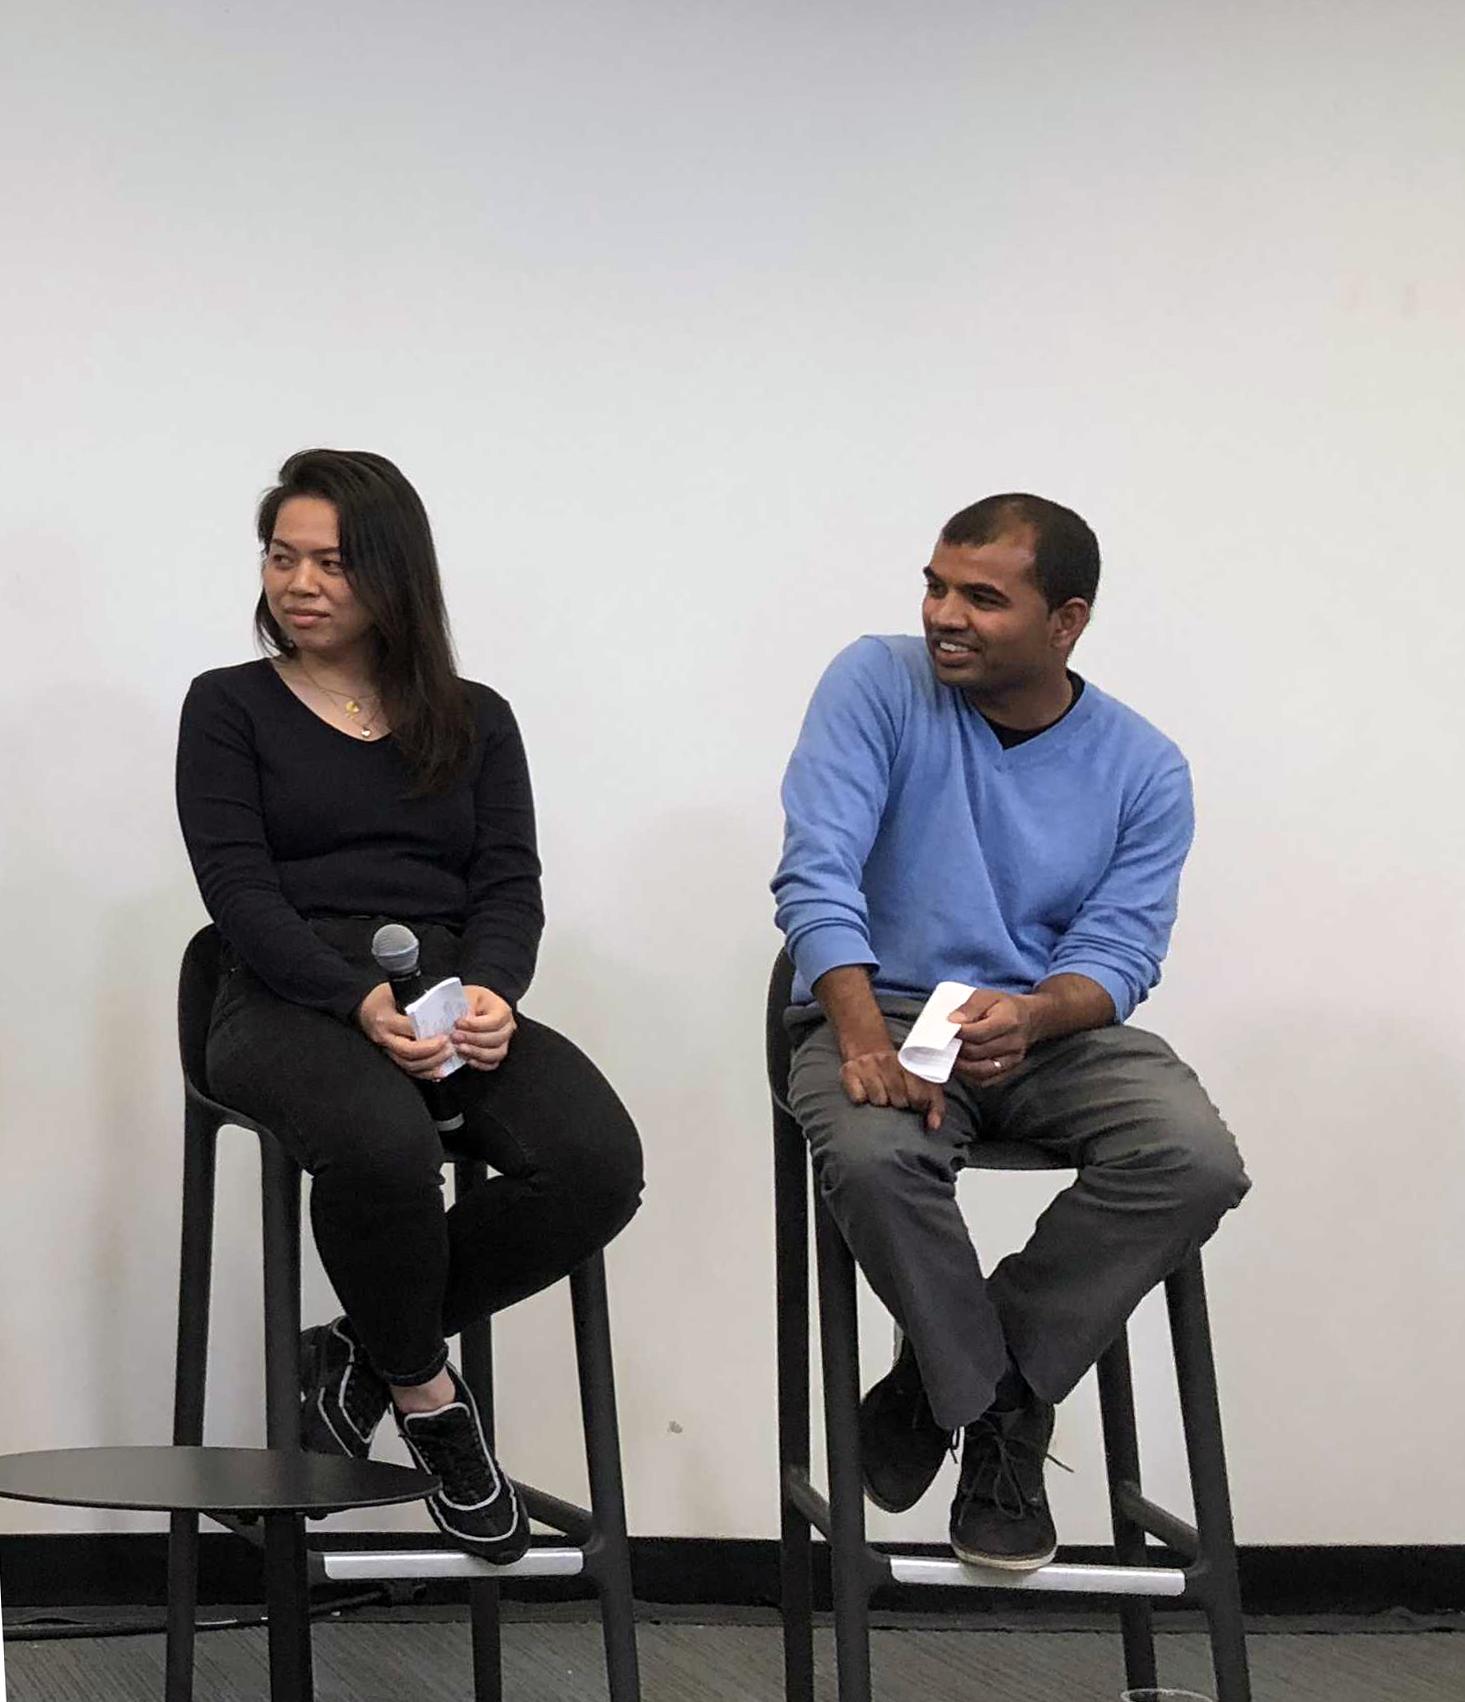 From left: Sam Lee (Senior Graphic Designer), Paulas Bhatt (Director of Program Management)